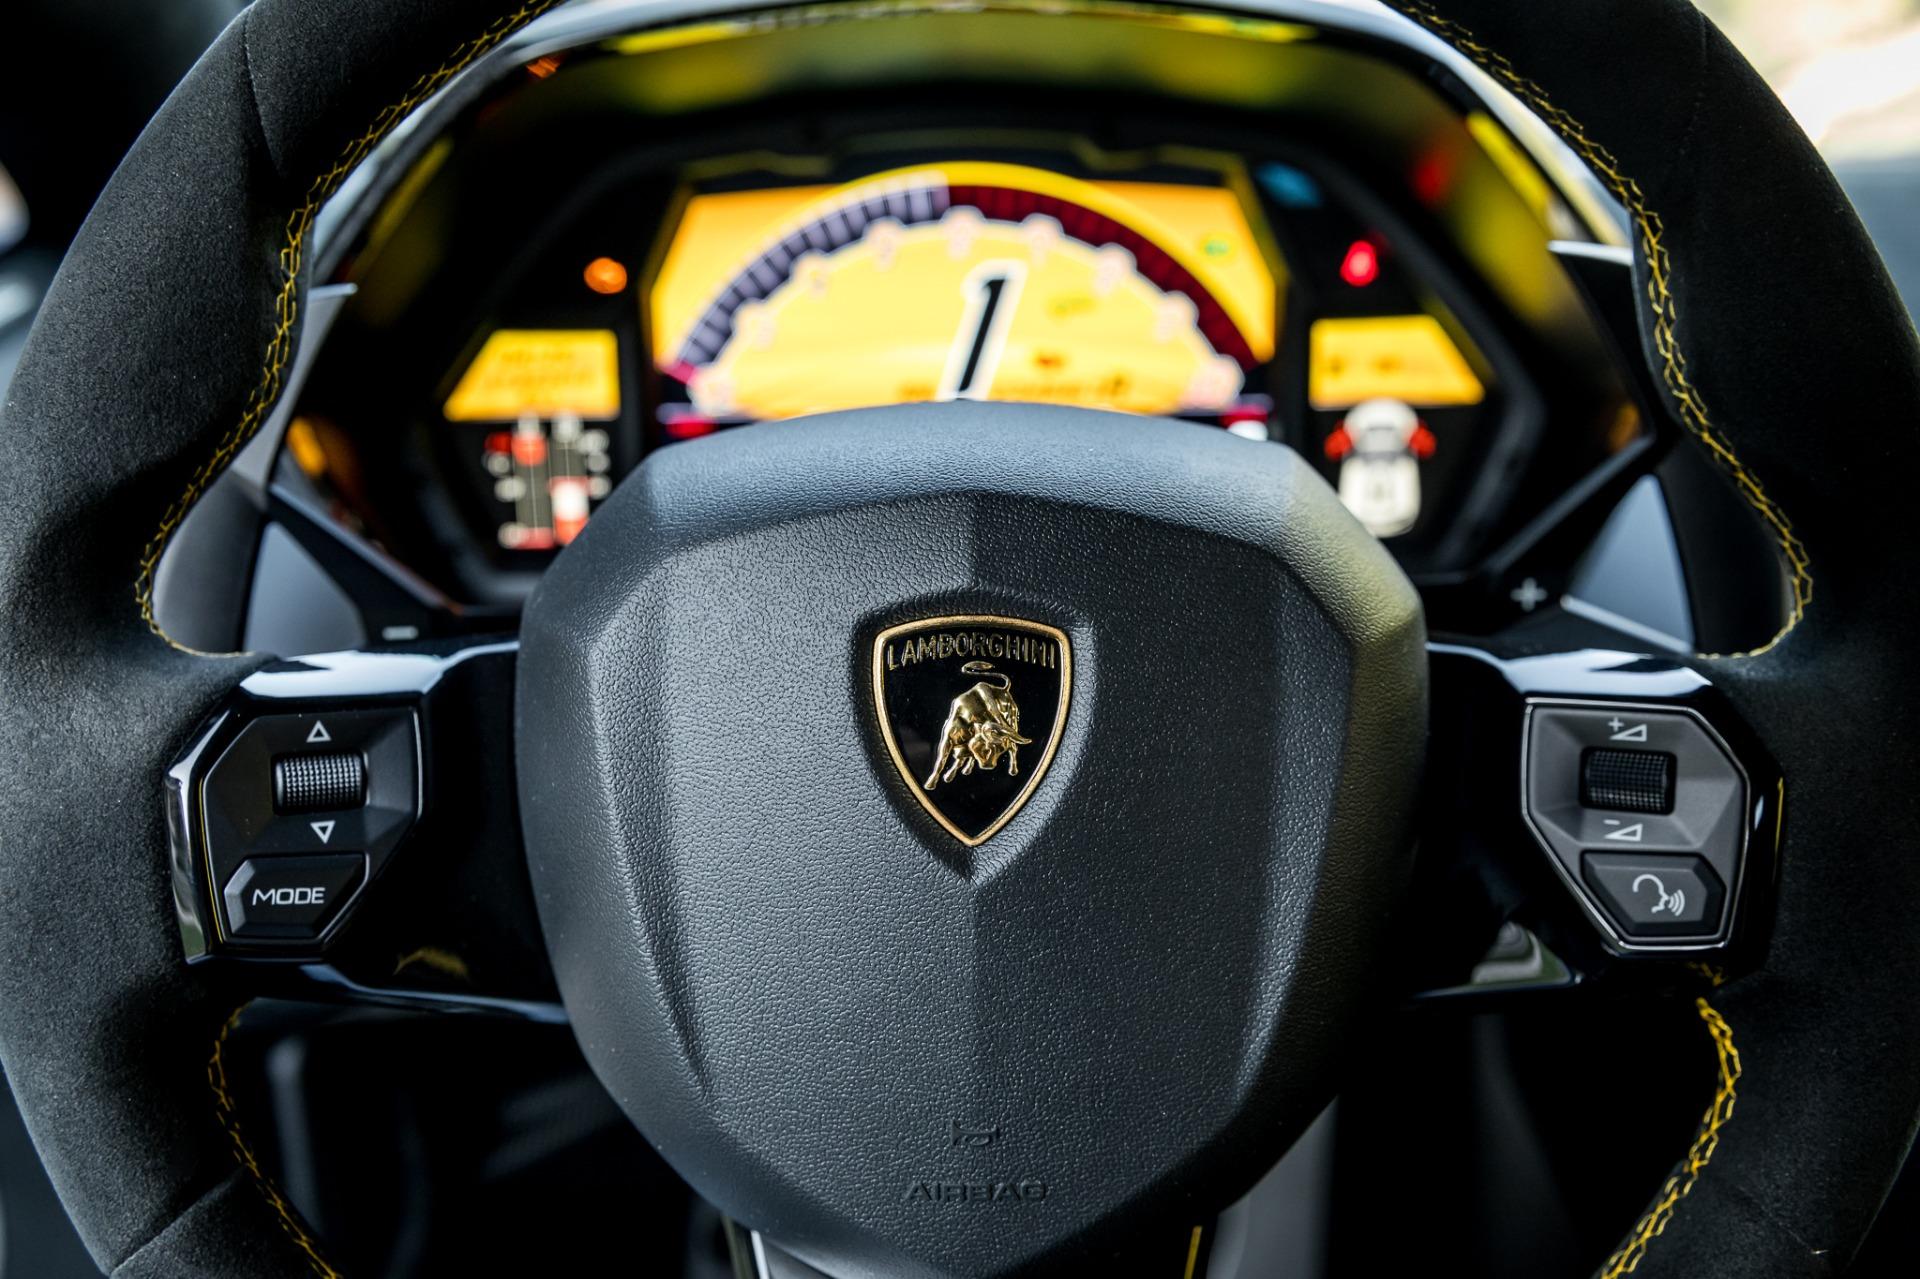 Used 2017 Lamborghini Aventador LP 750-4 SV / 740HP / AWD / 1930 MI / NAV / CAMERA for sale Sold at Formula Imports in Charlotte NC 28227 39